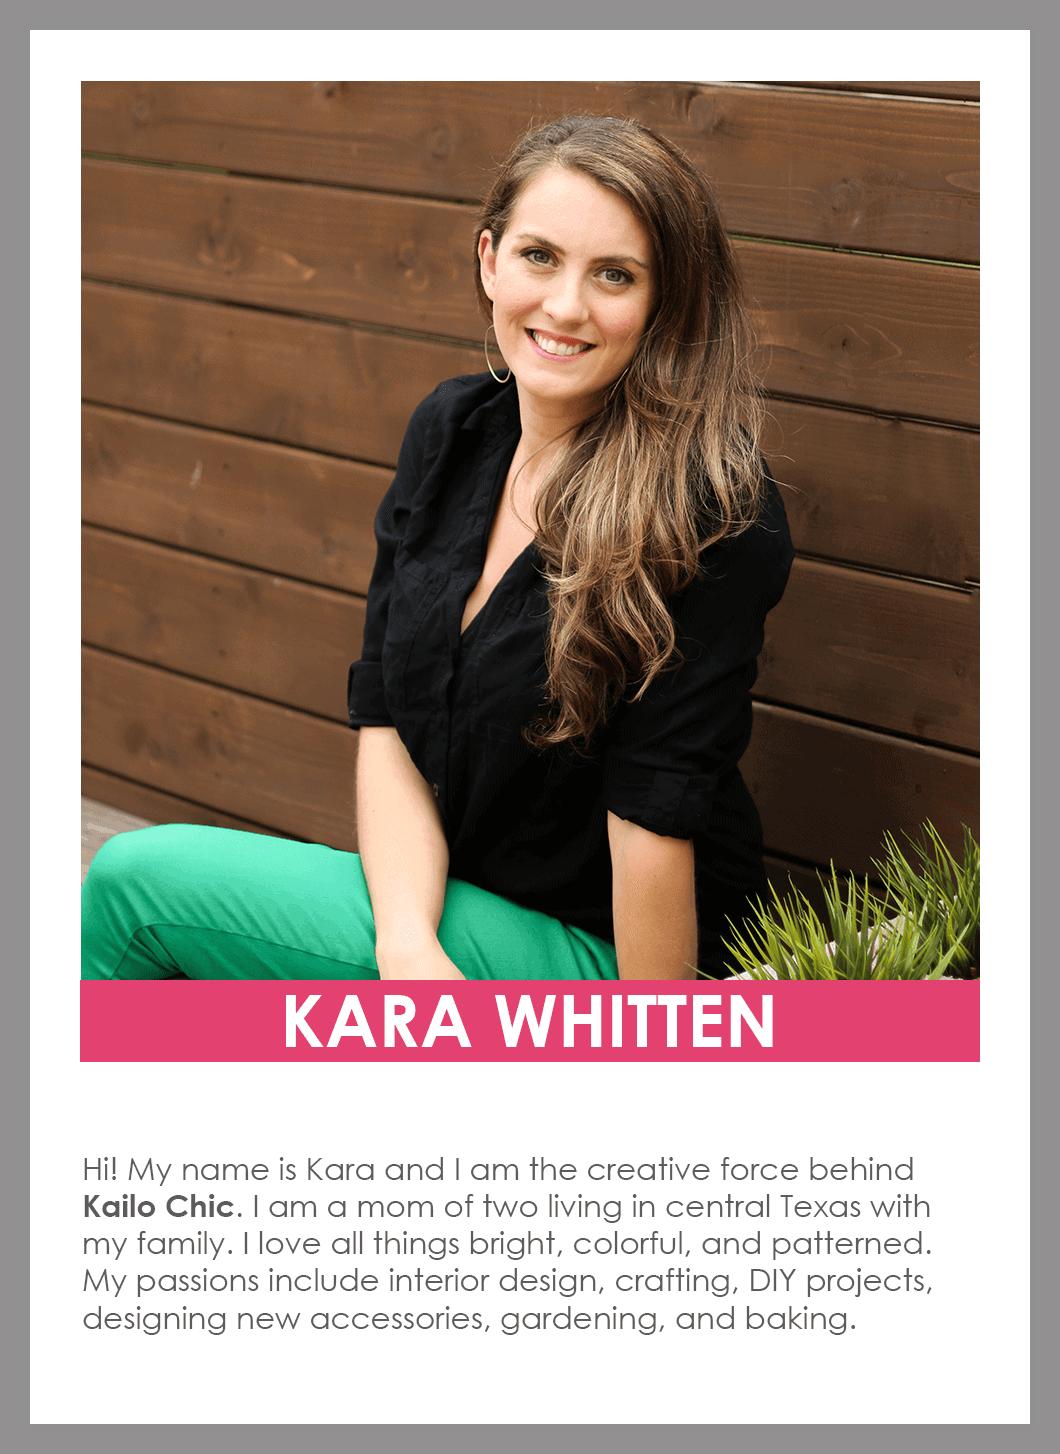 Kara Whitten